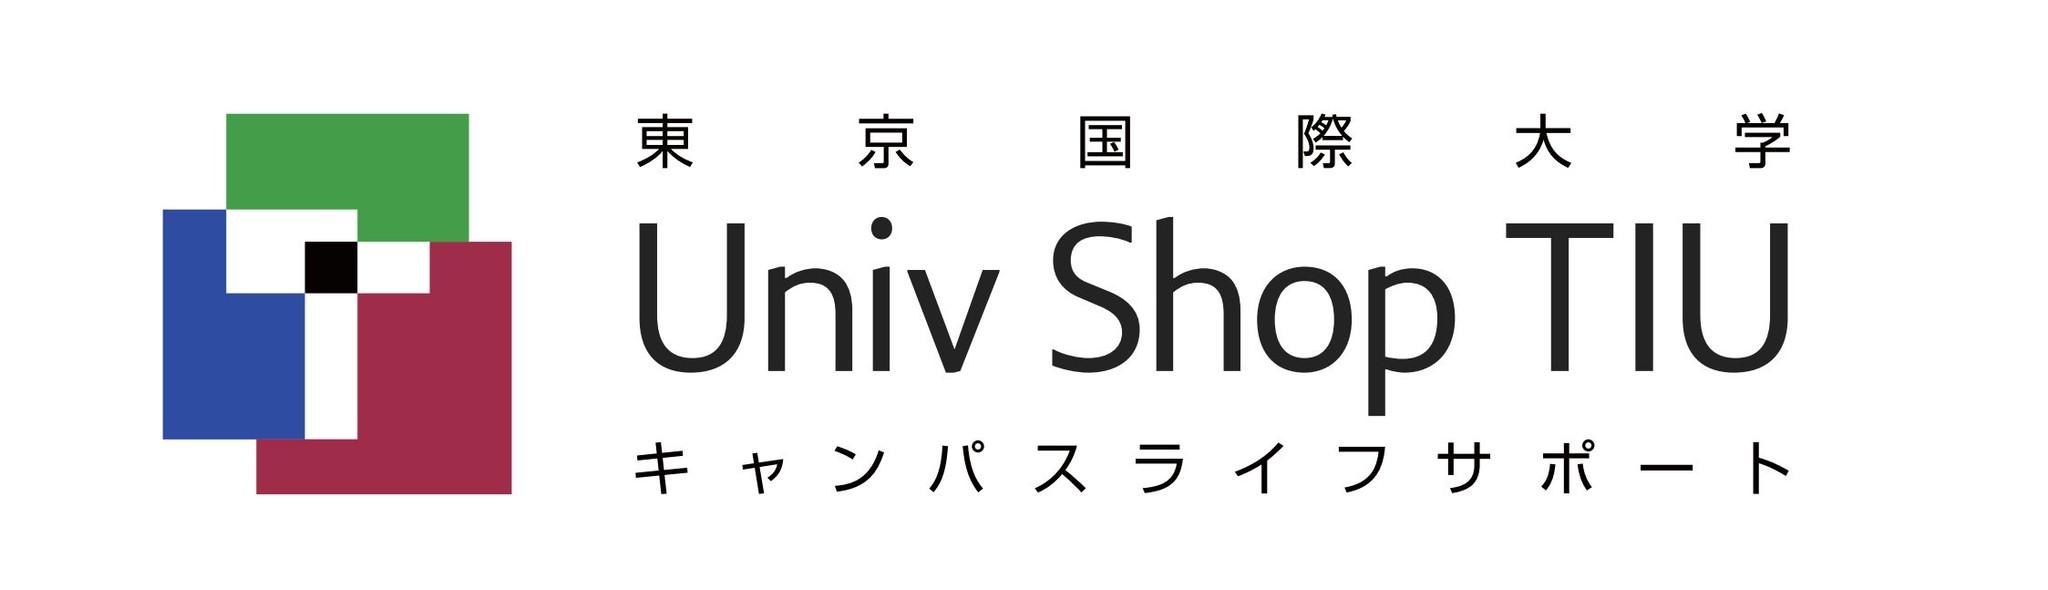 Univ Shop TIU